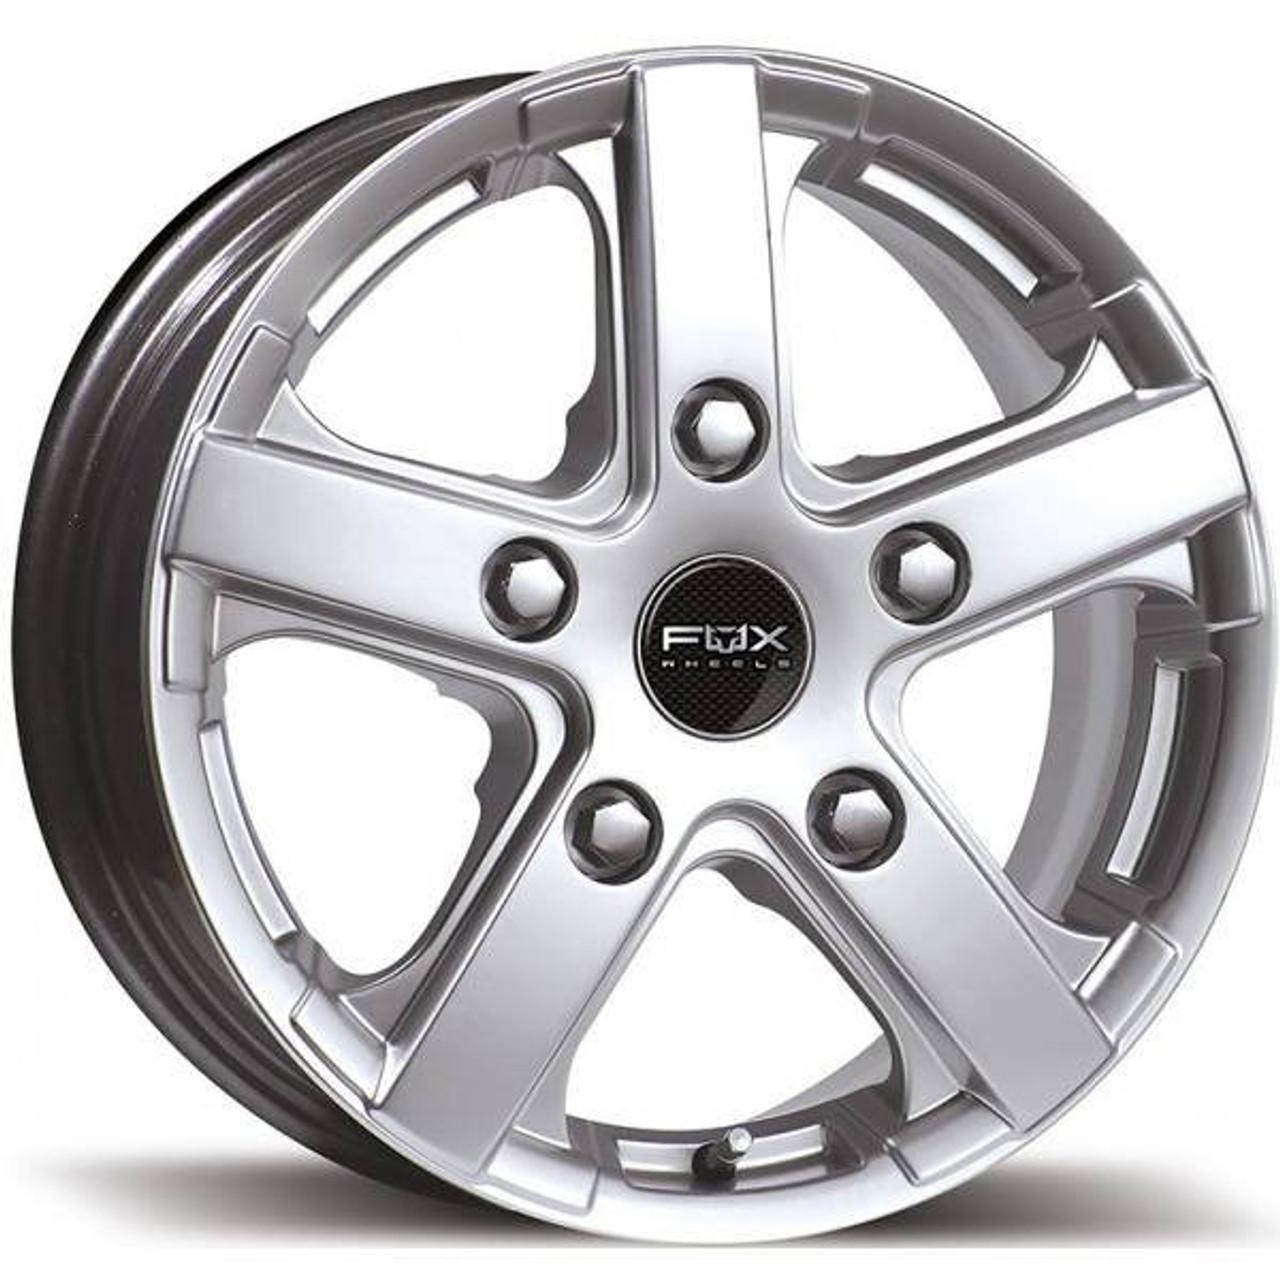 FOX Viper 1 Alloy Wheels Silver